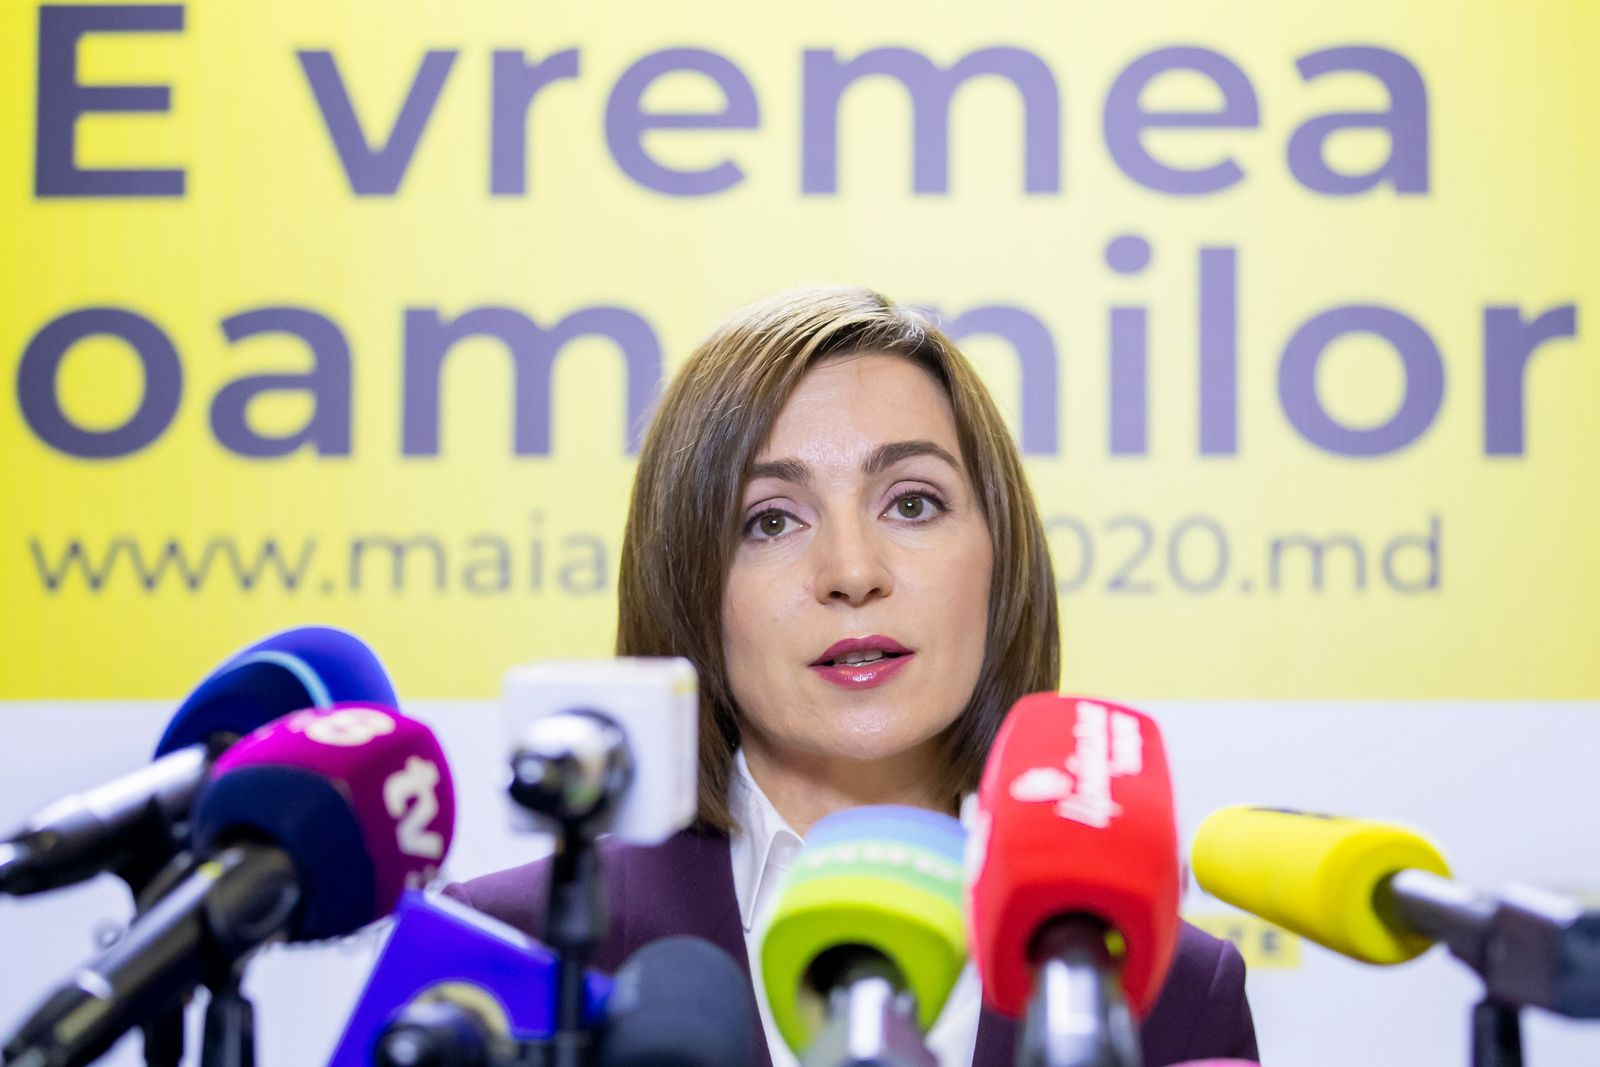 Presidential elections in Moldova, Chisinau, Moldova Republic Of - 16 Nov 2020